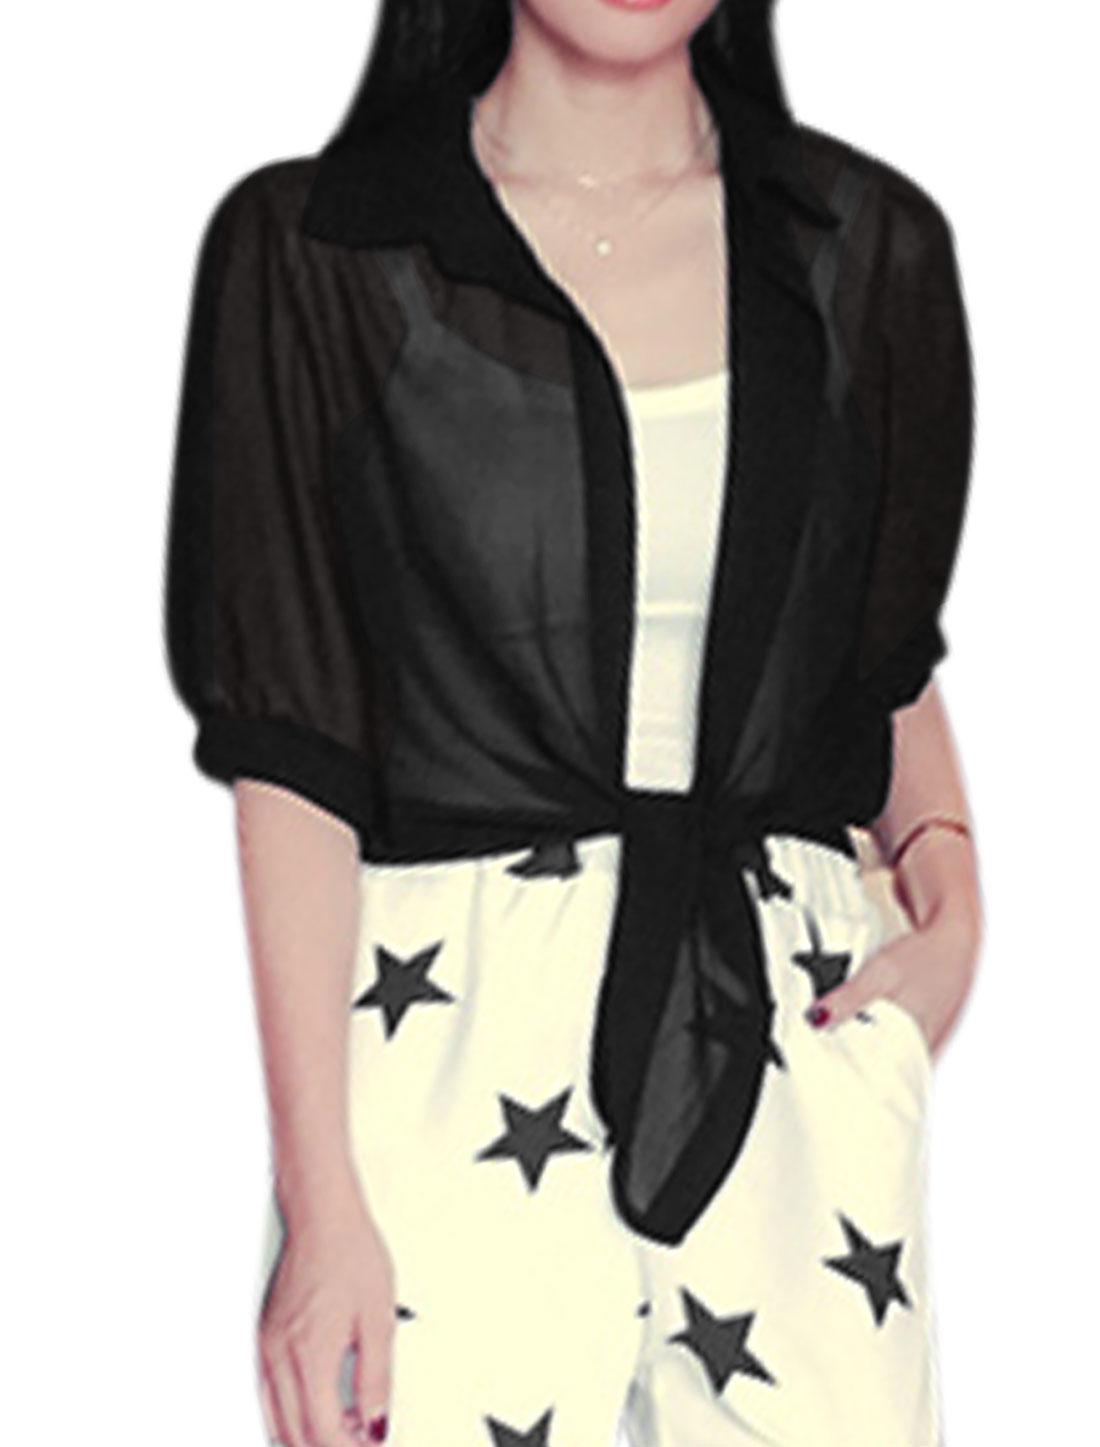 Ladies Elbow Sleeves Buttonless Self Tie Waist Chiffon Cardigan Black XS